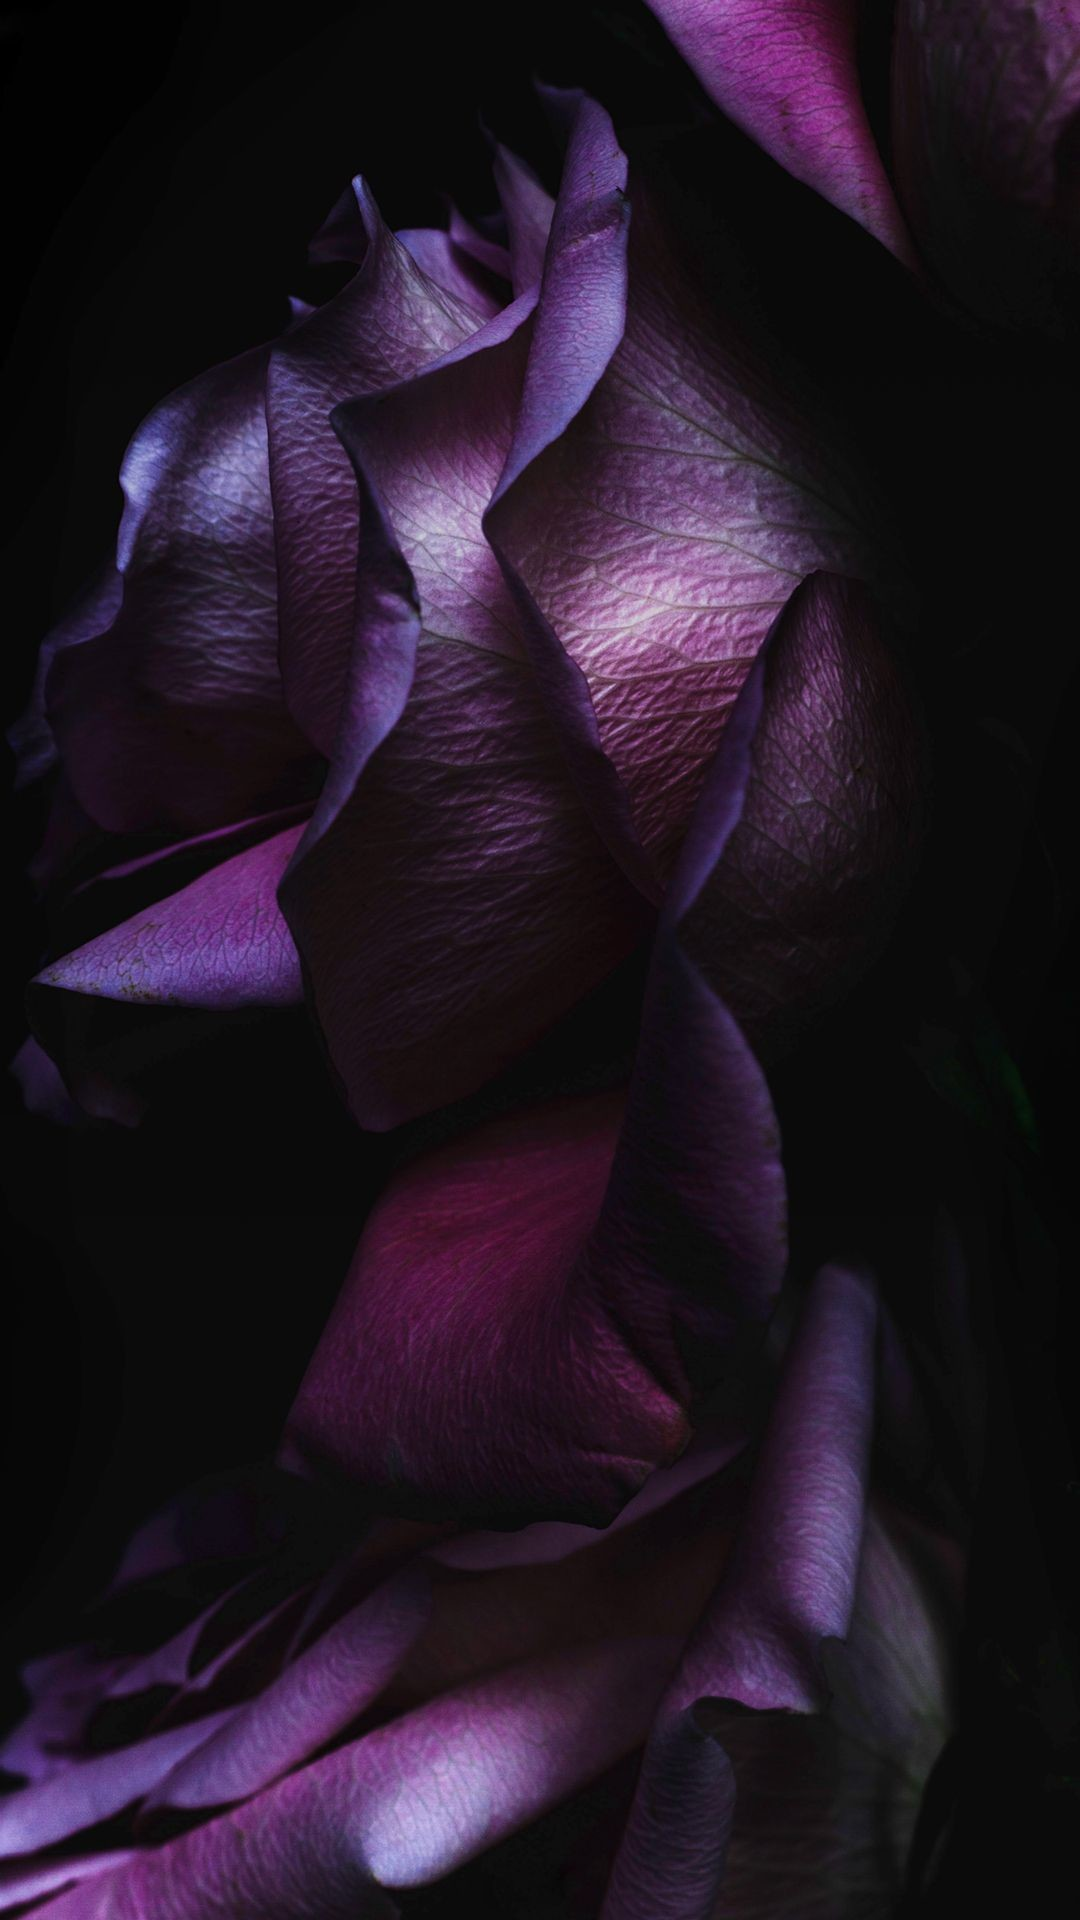 Res: 1080x1920, iOS9 Purple Rose Flower Art Wallpaper #iPhone #6 #wallpaper